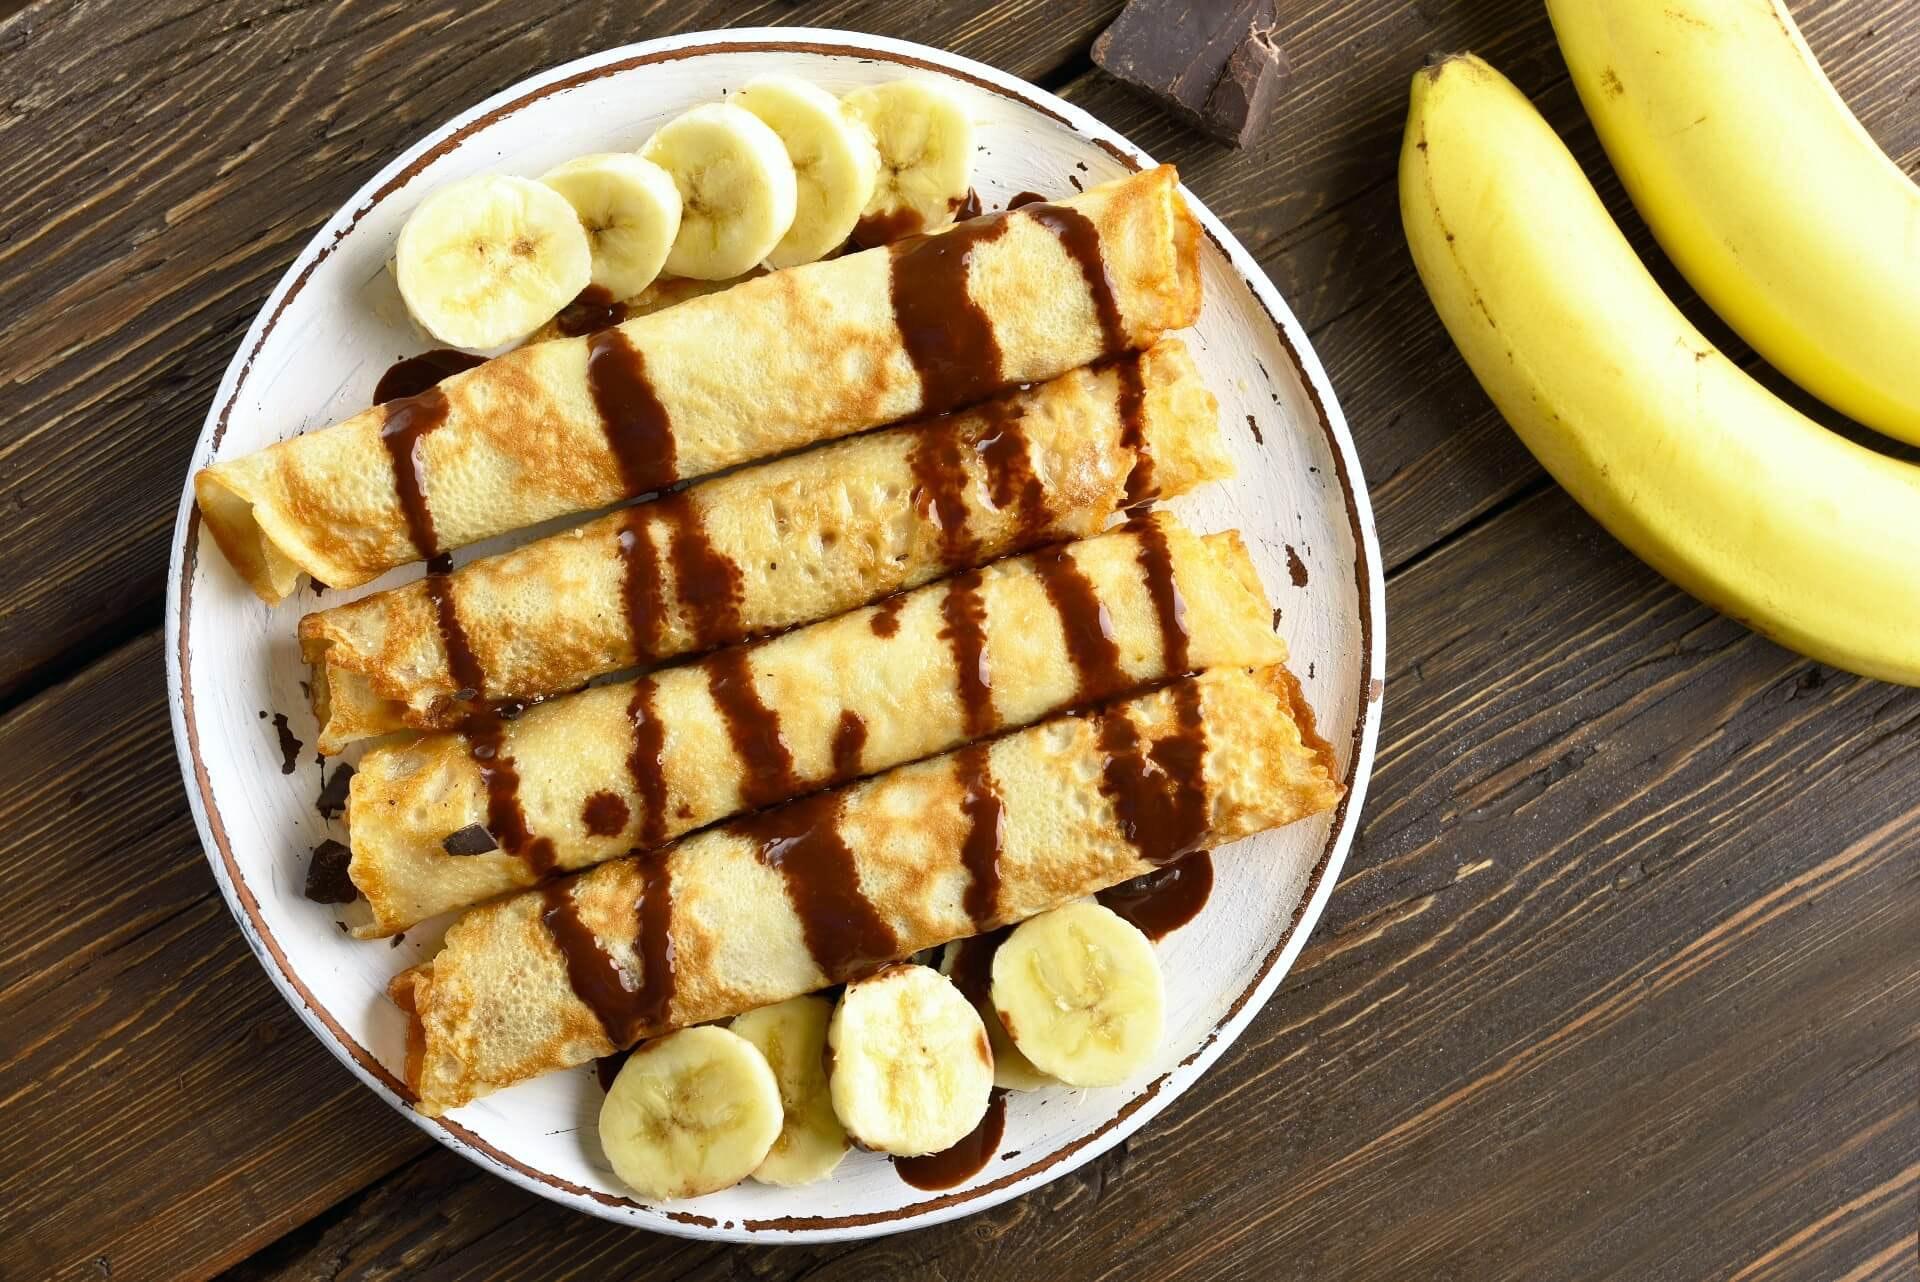 Banana Roll Liposuction